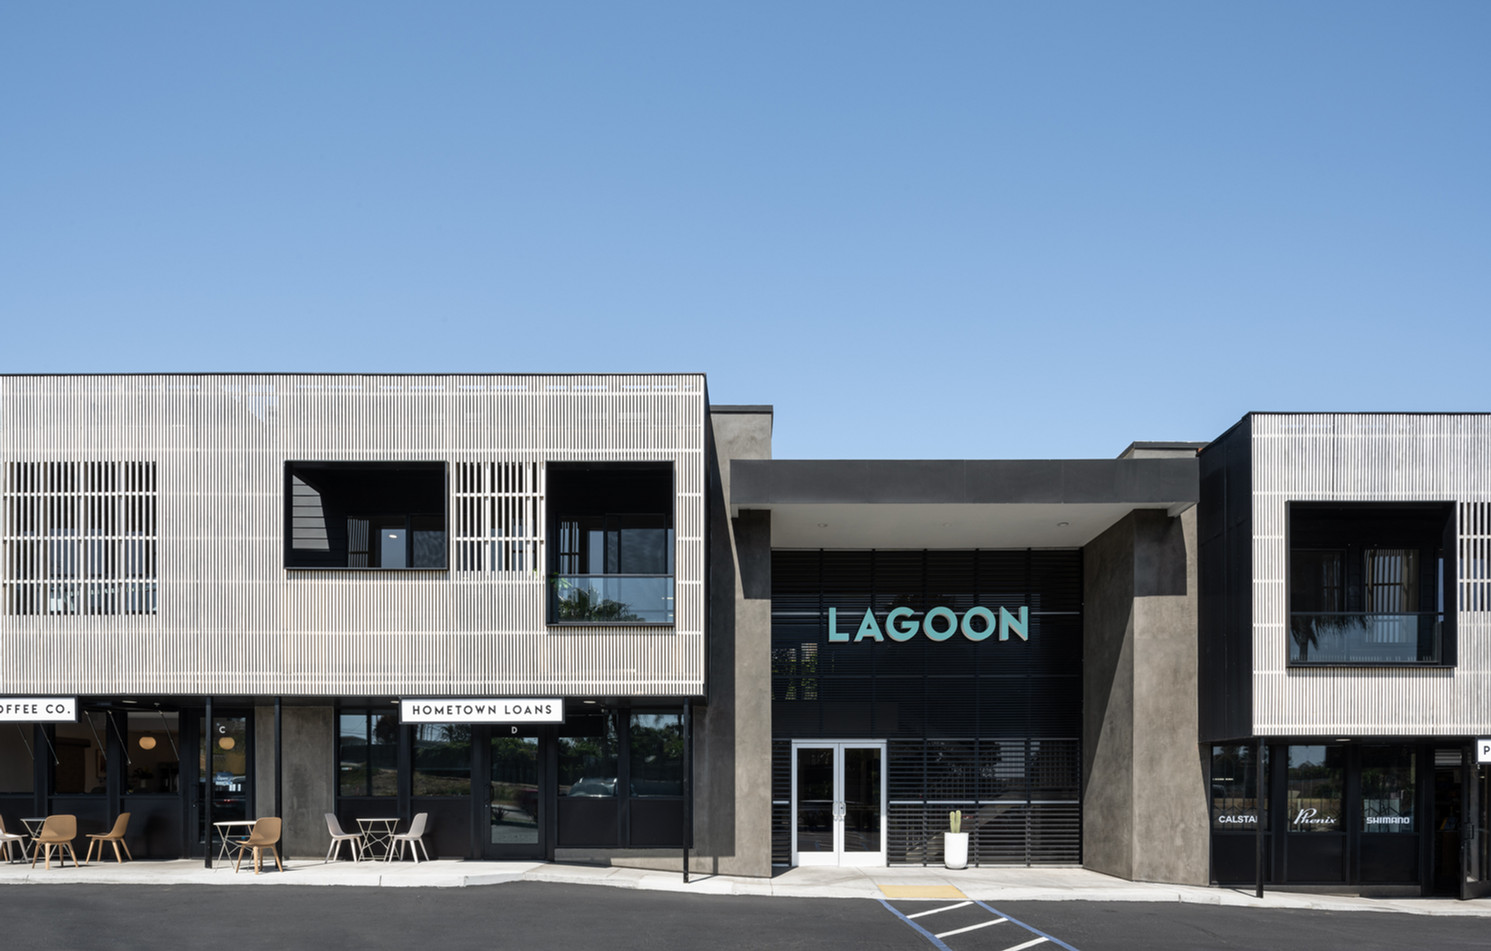 Lagoon_GregColeman_IanPatzkePhotography (6 of 10).JPG